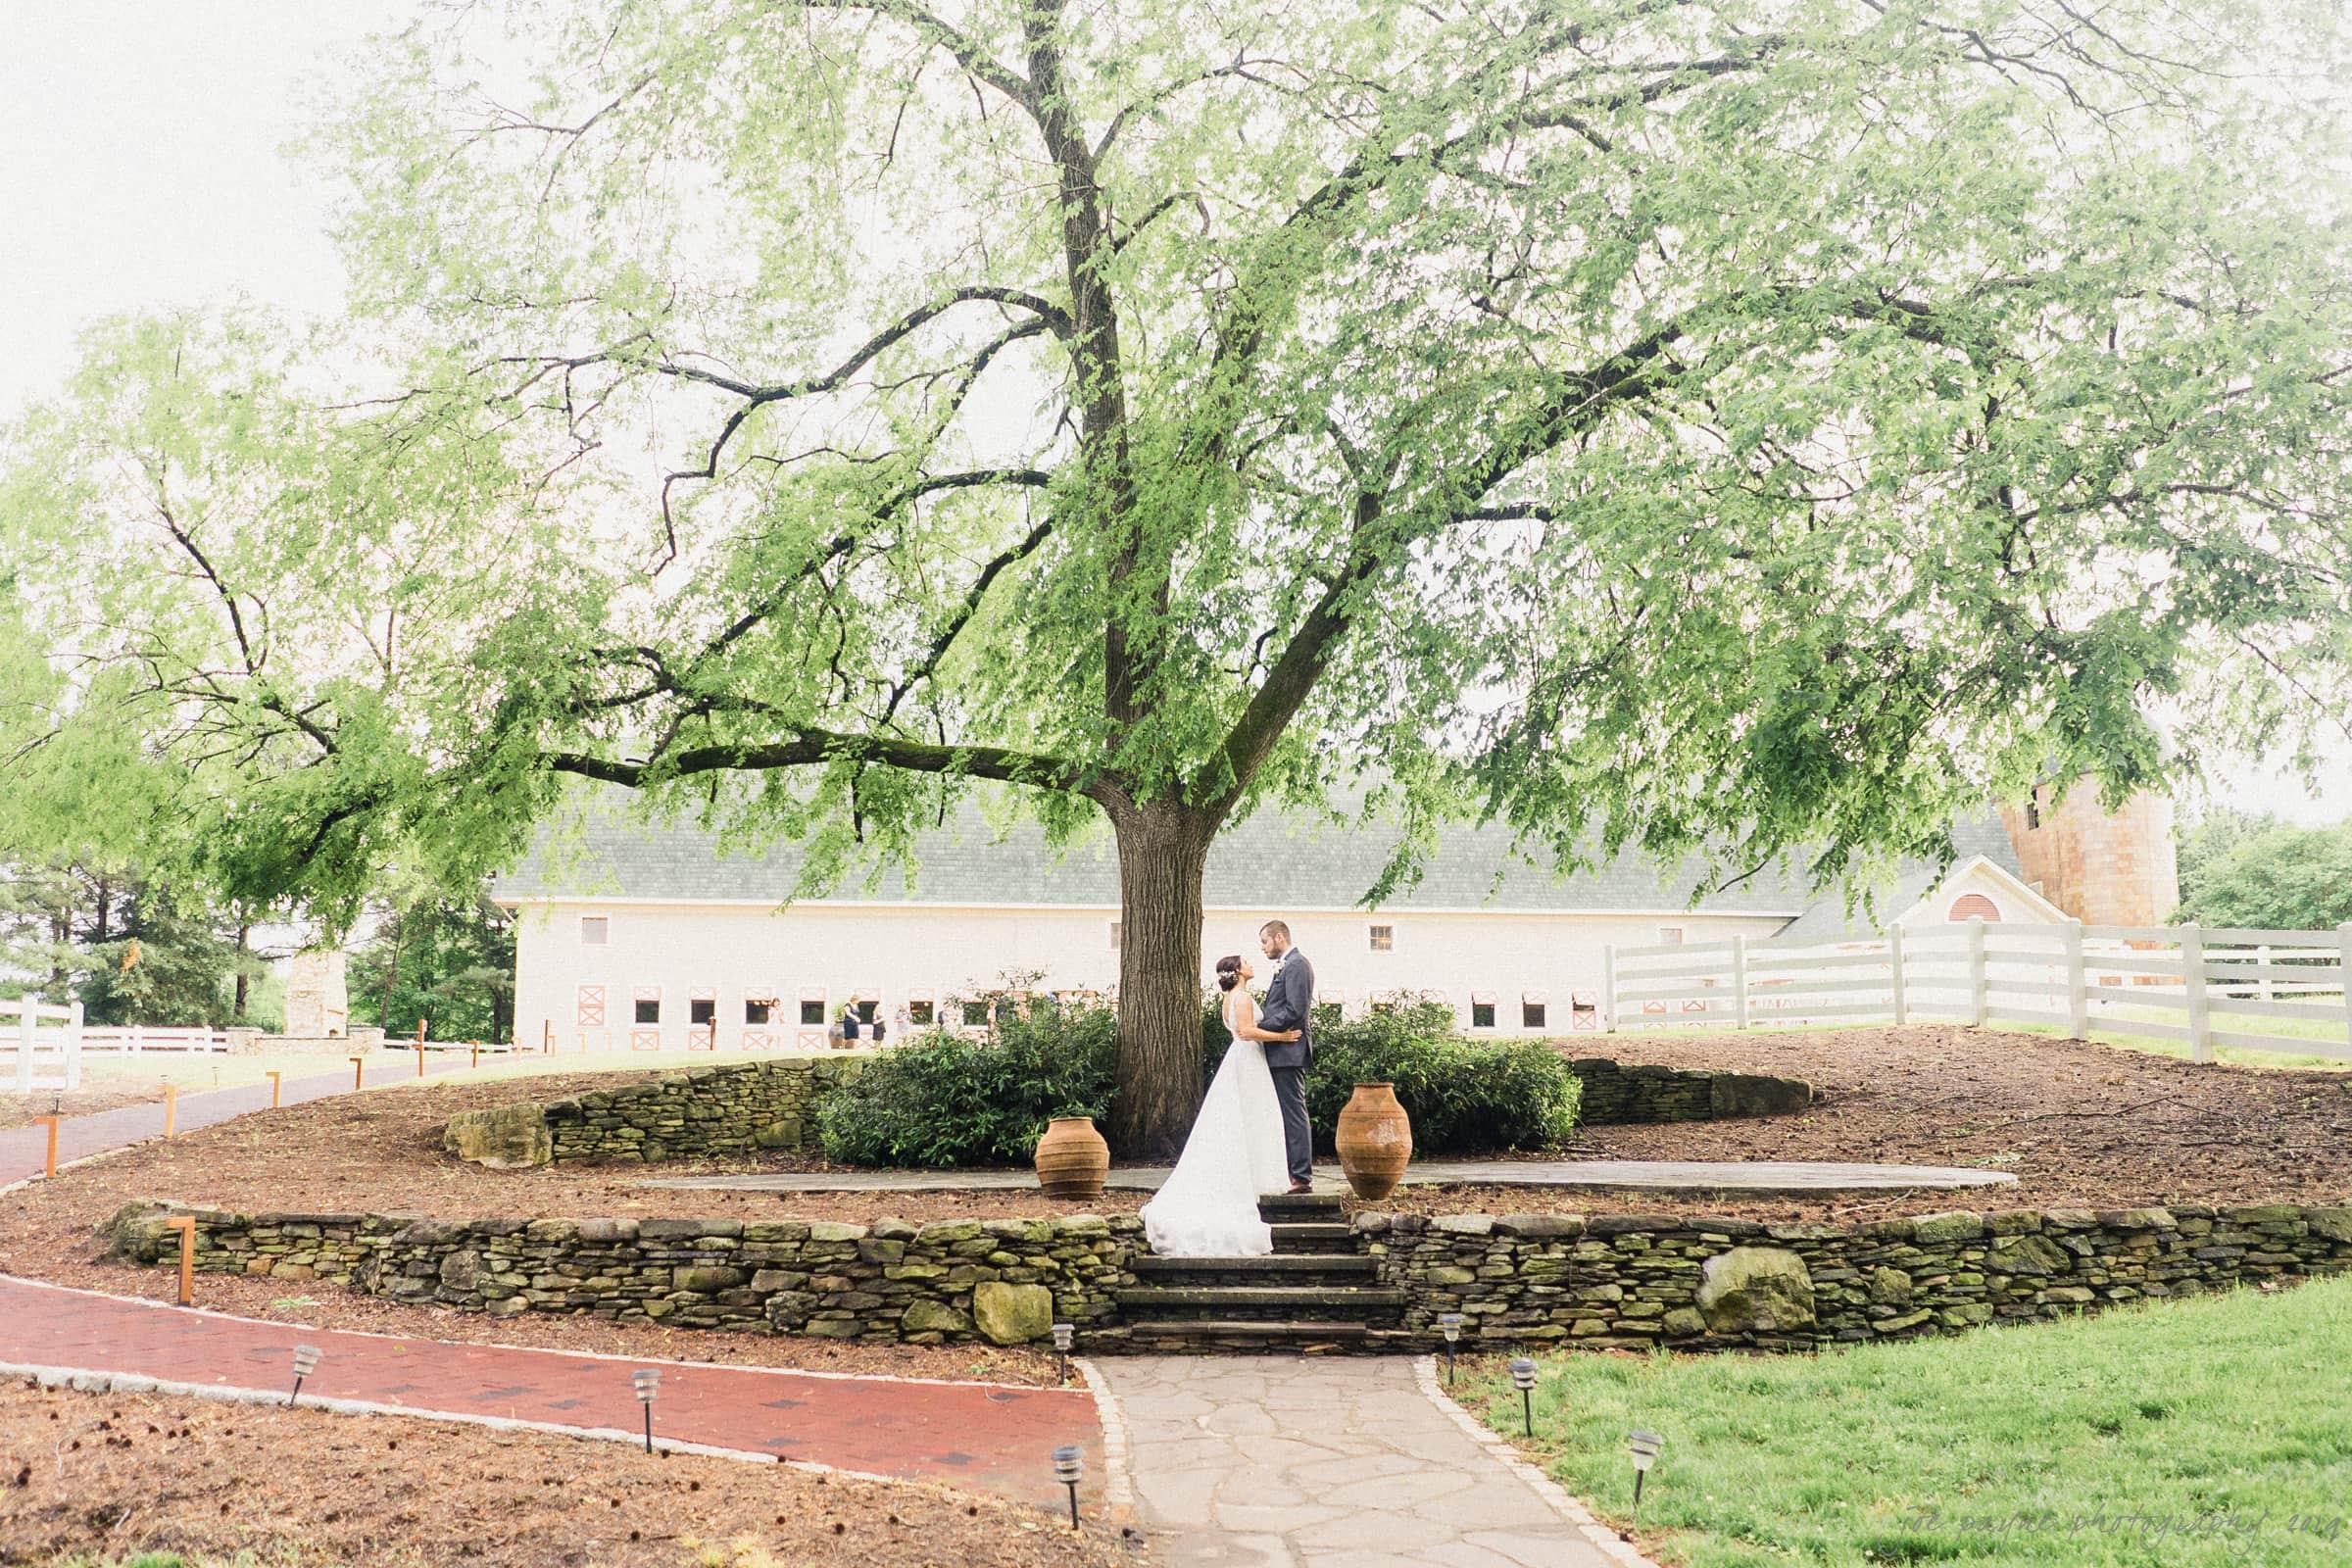 wakefield-barn-wedding-hannah-wayne-41